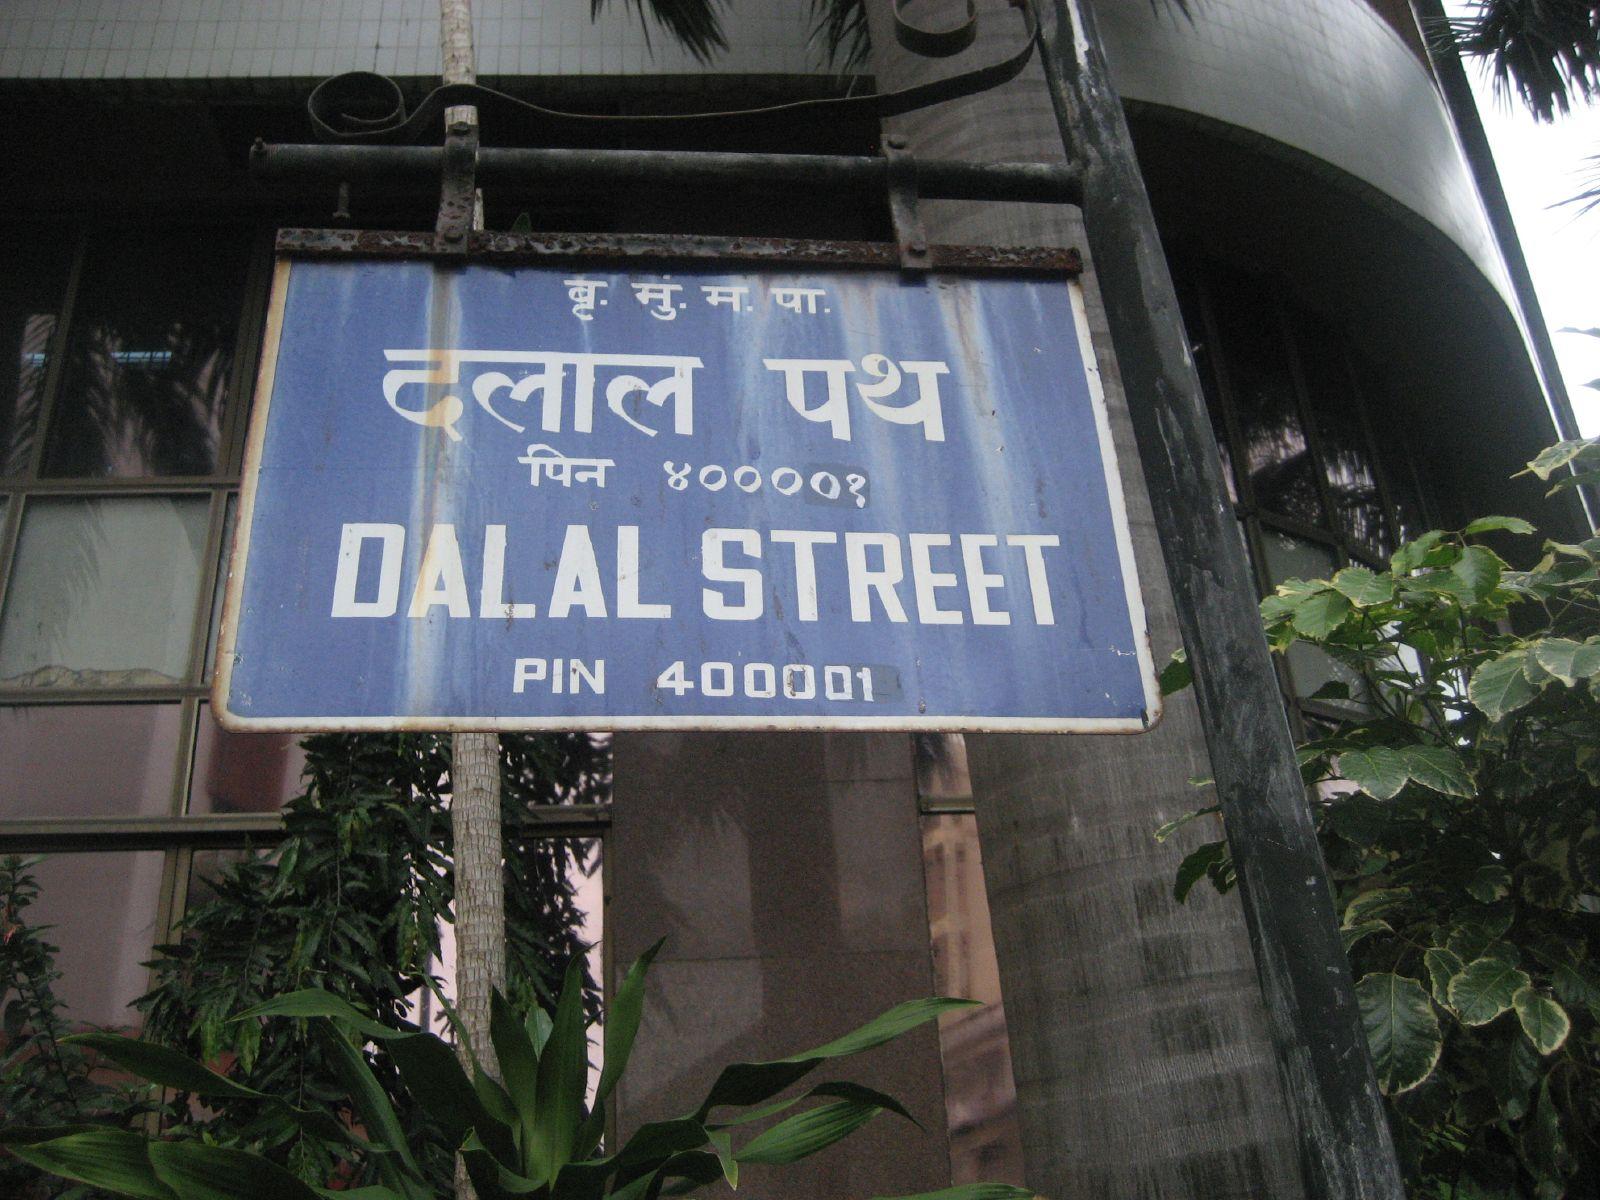 Dalal Steet signage